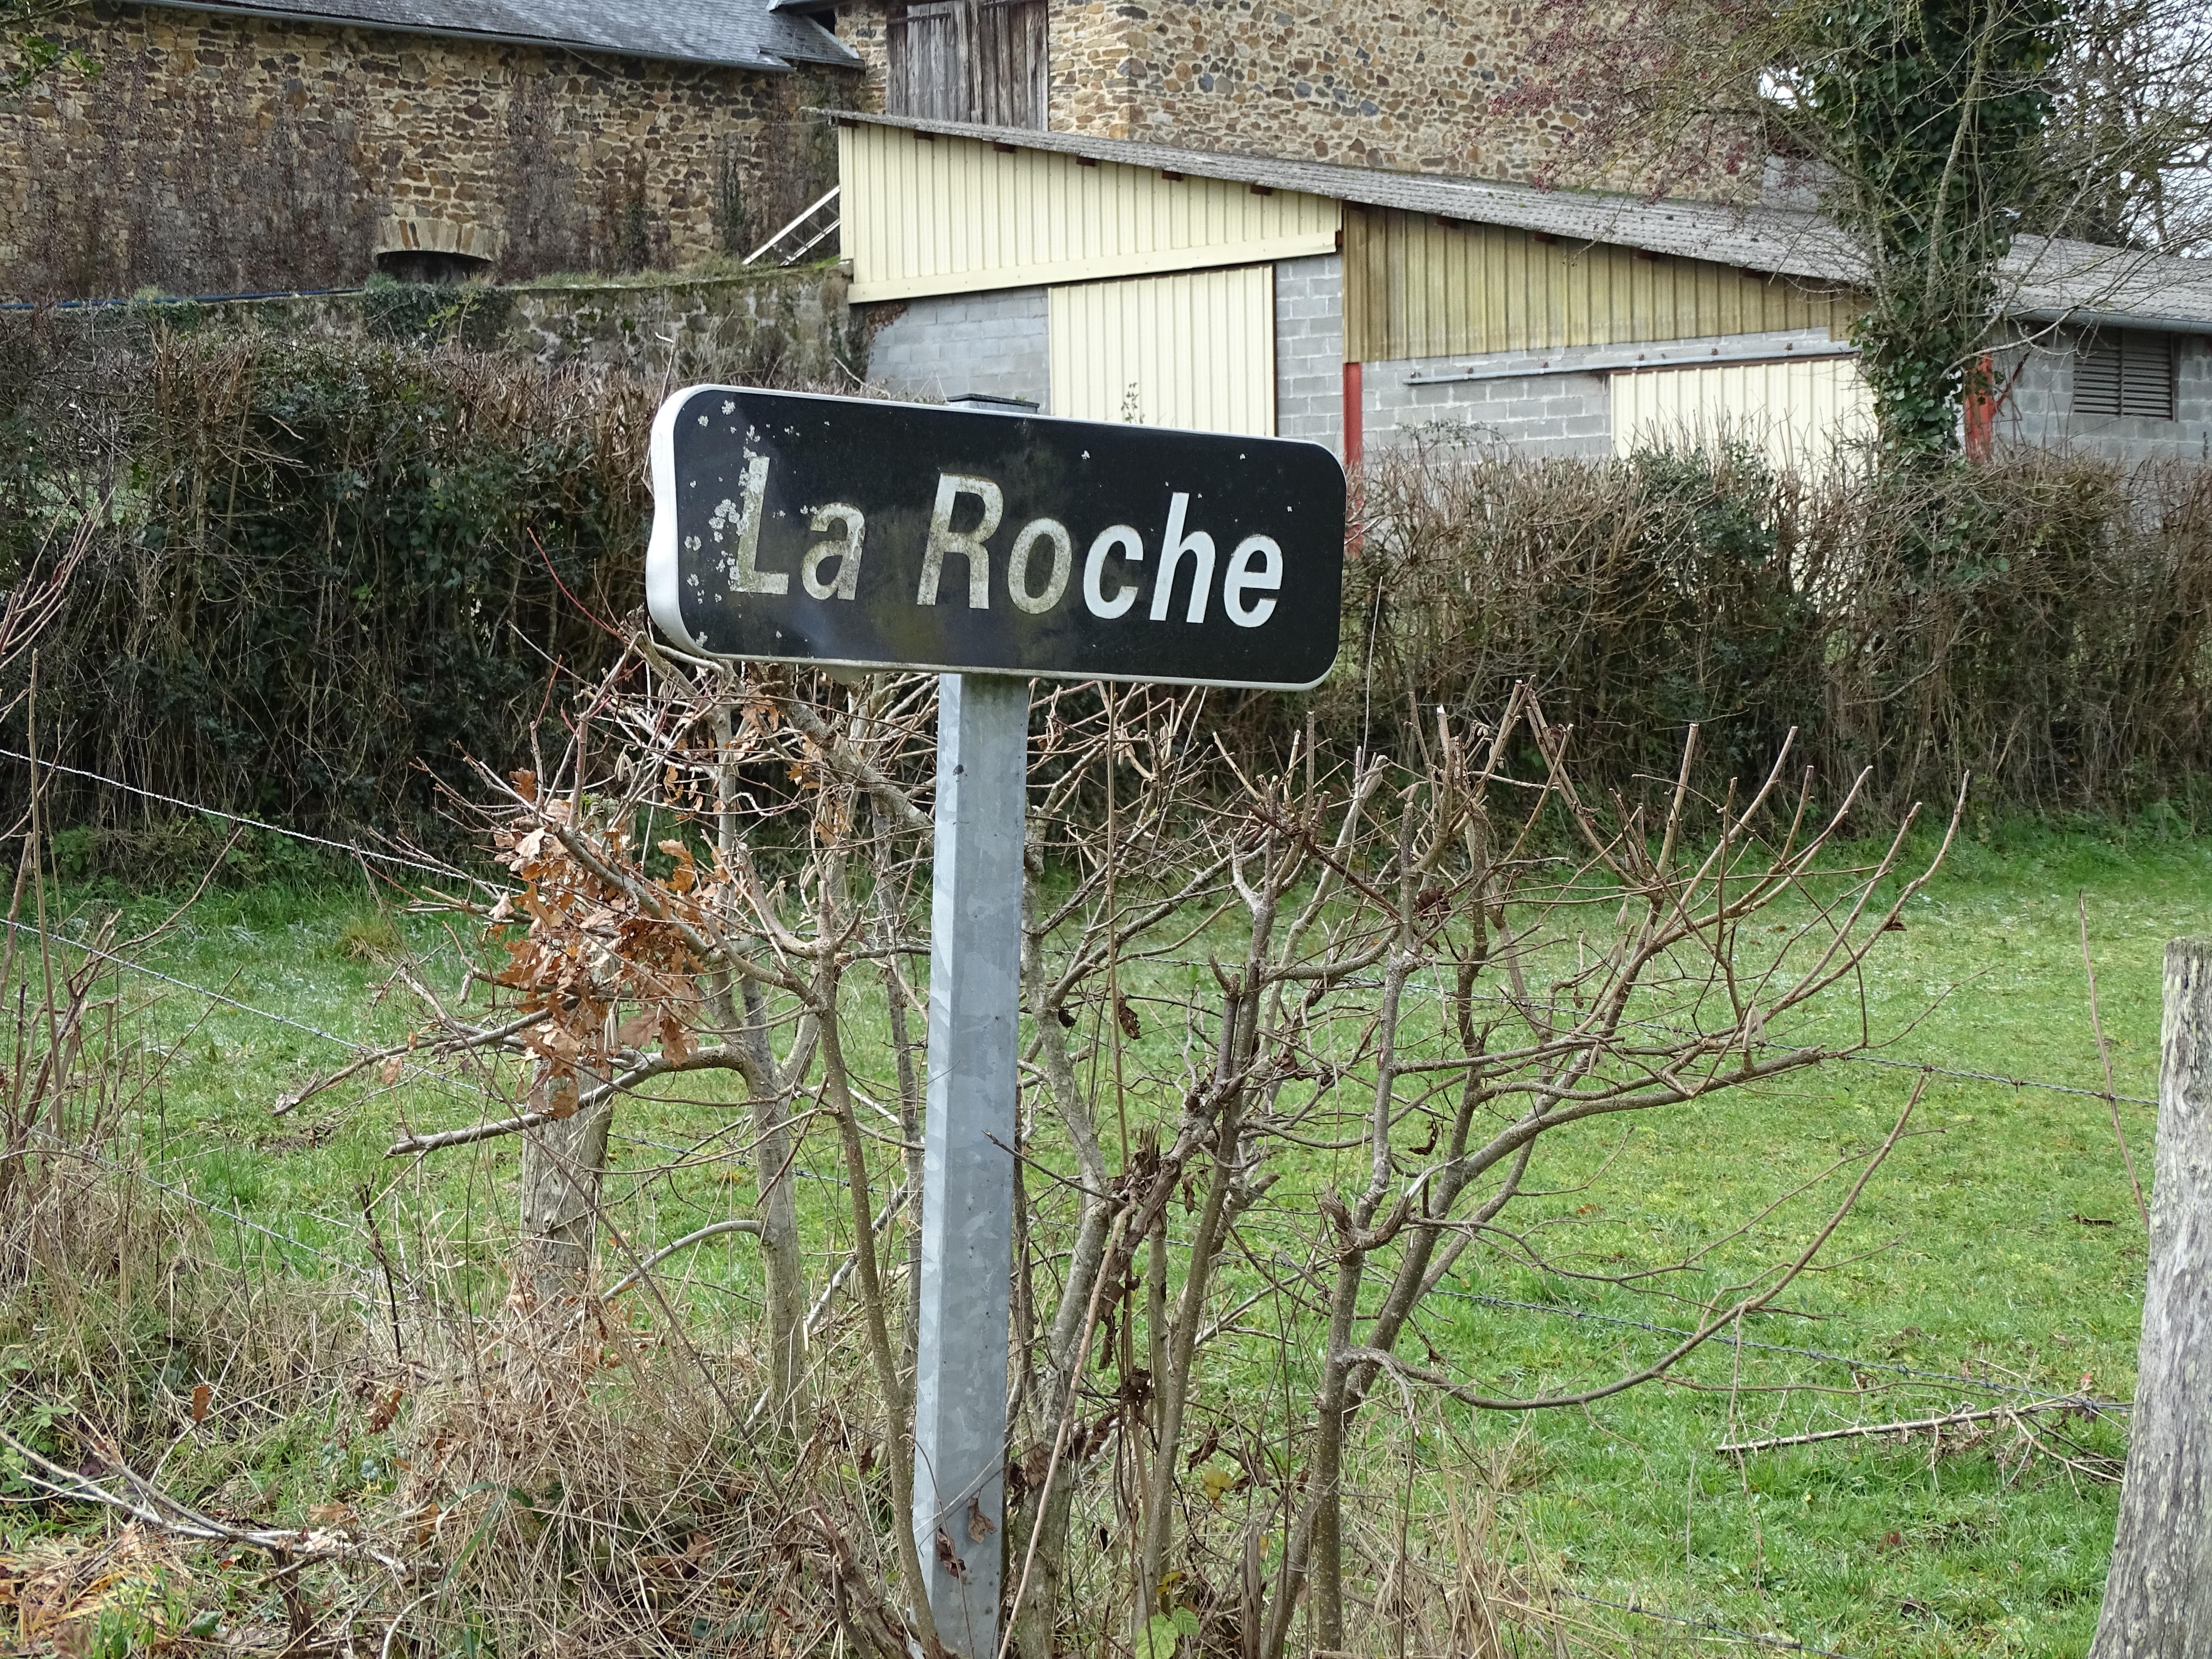 Street sign of La Roche